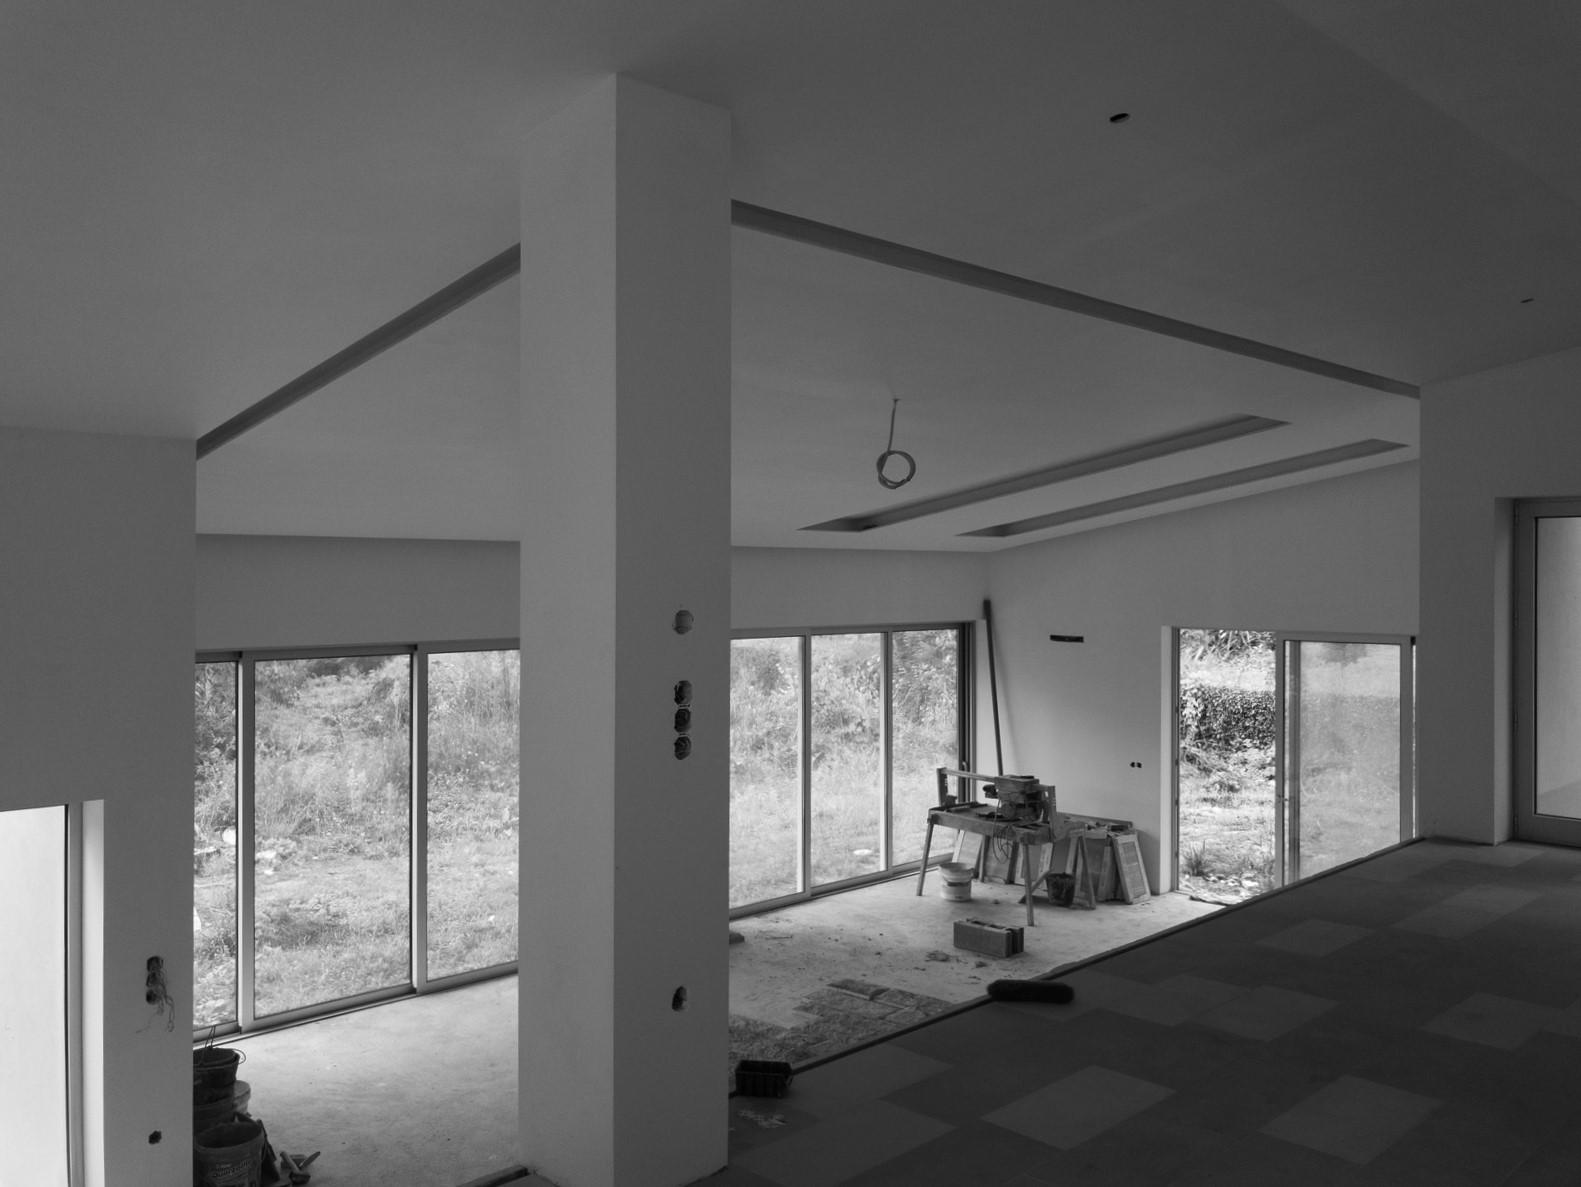 Moradia S+N - arquitectura - EVA evolutionary architecture - arquitectos porto - oliveira de azemeis (10).jpg